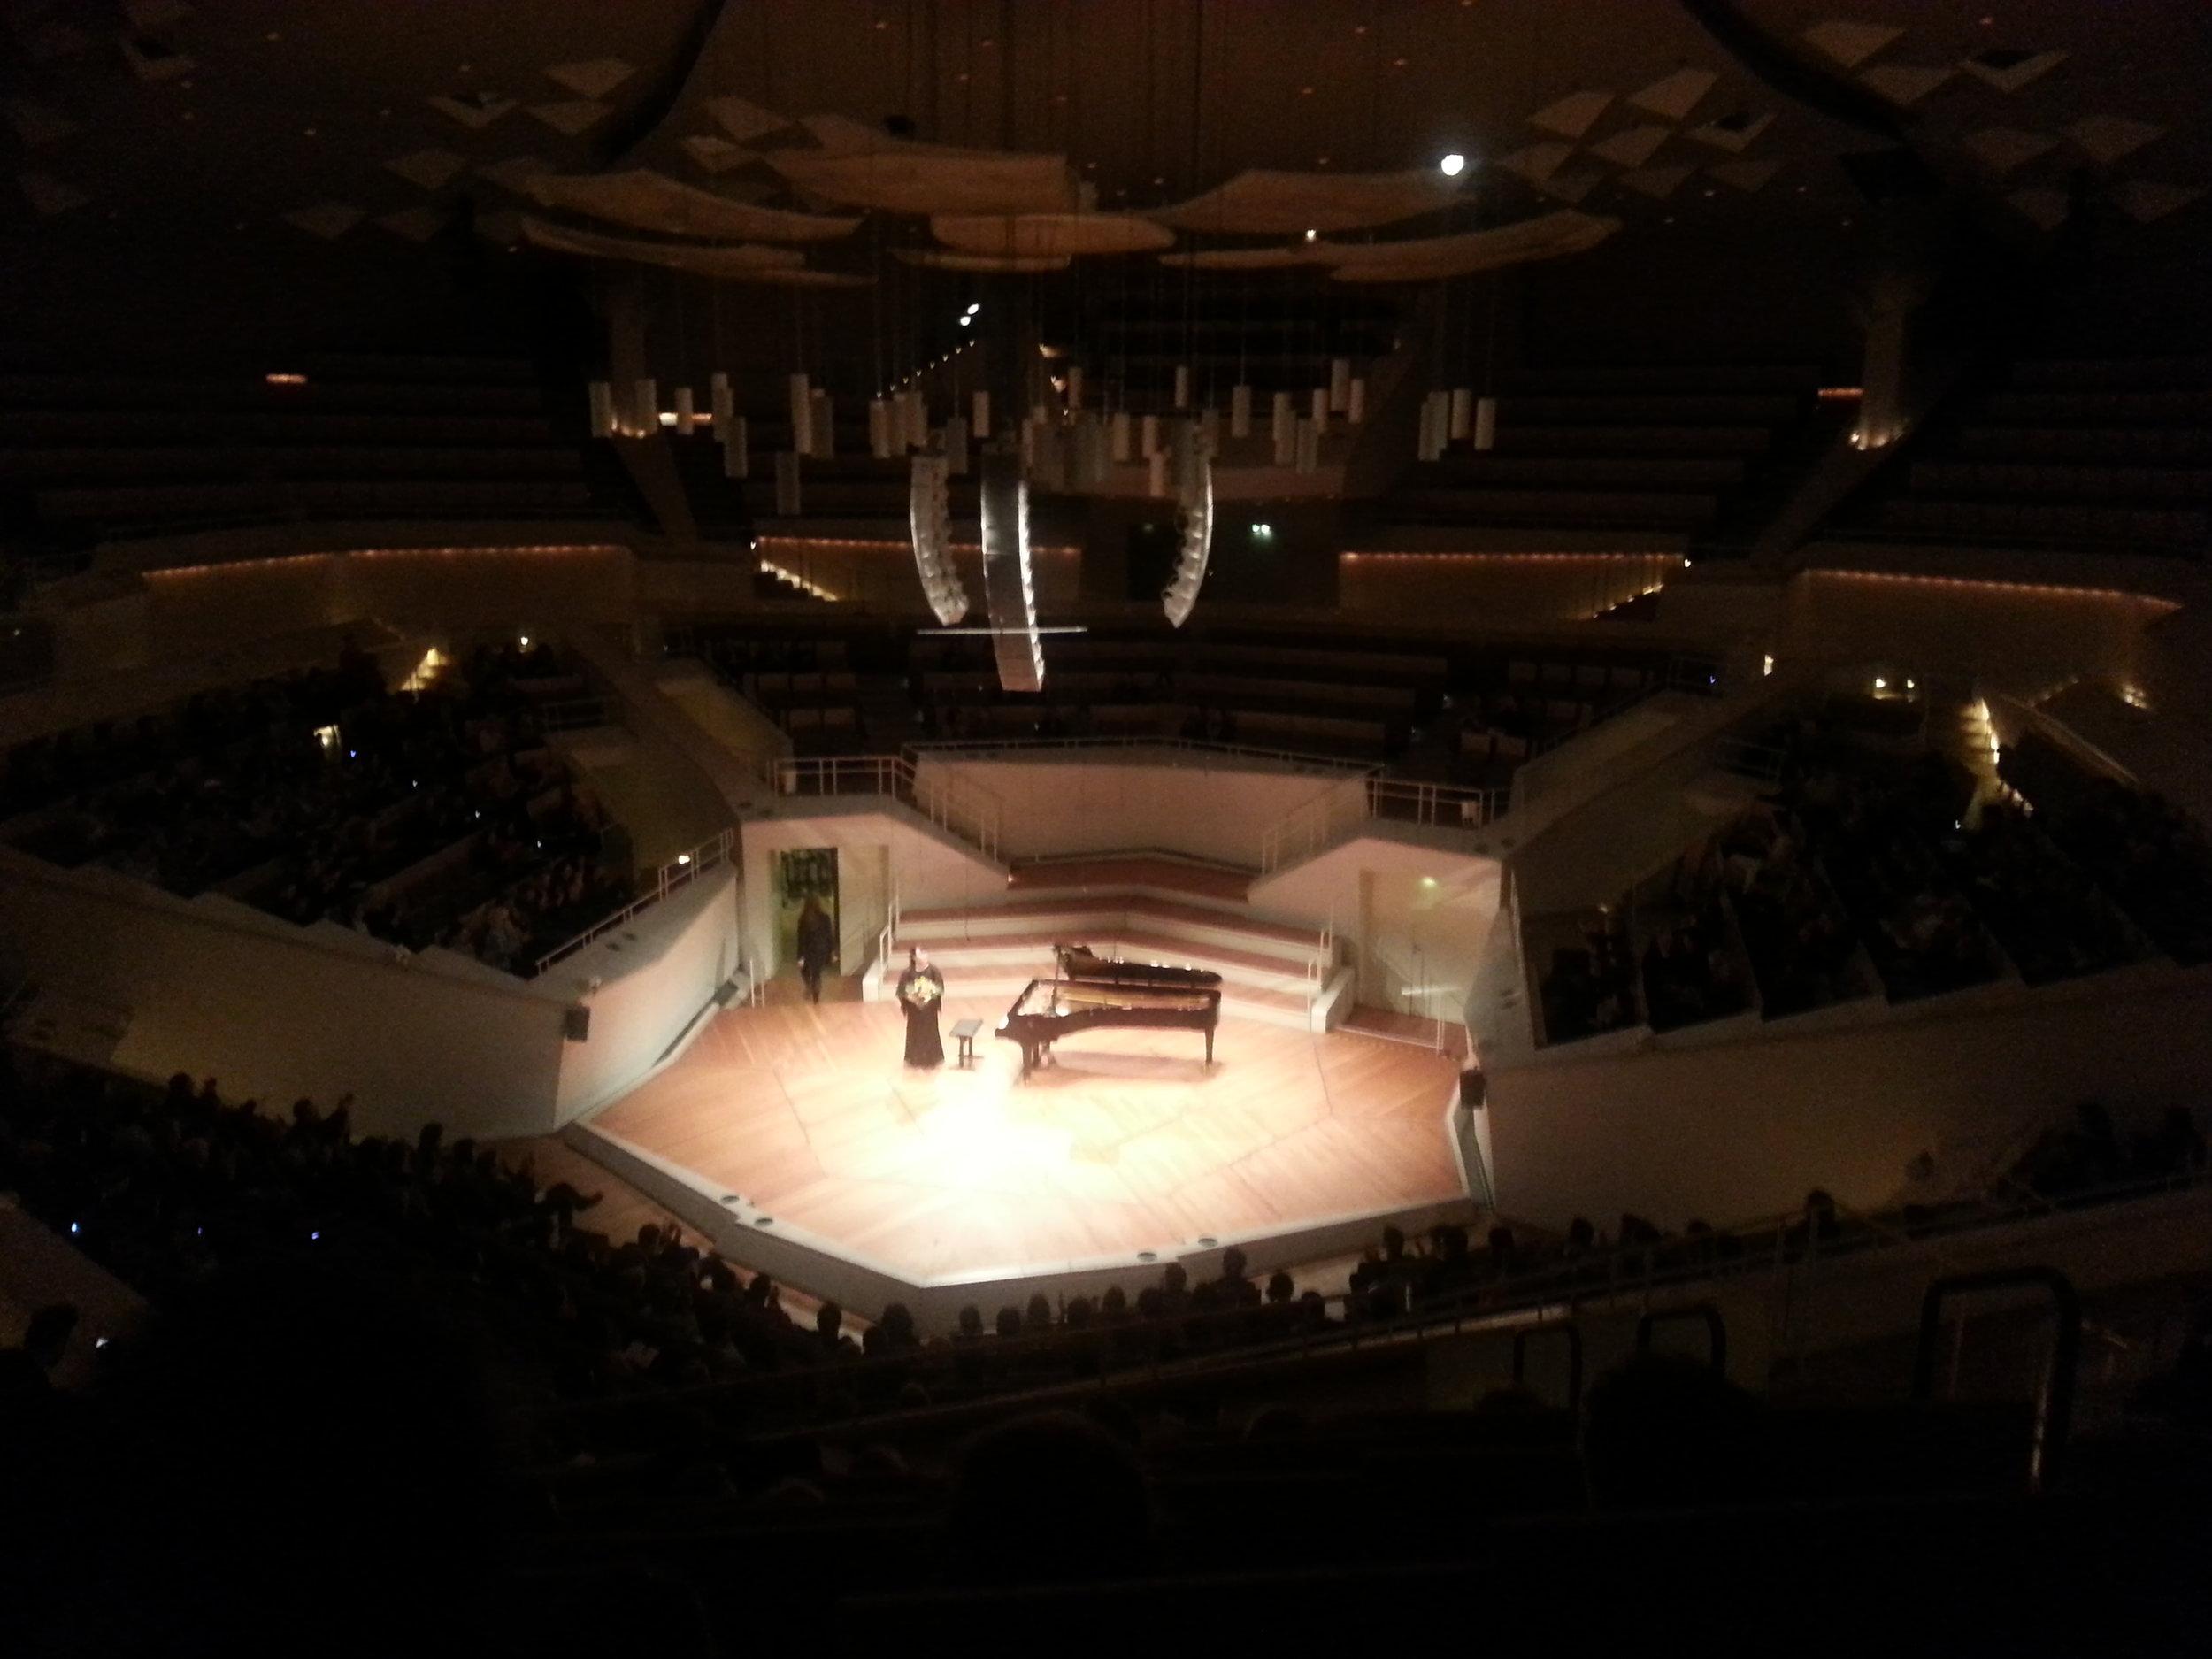 2015 April 13th Berlin Philharmonie Concert(3).jpeg